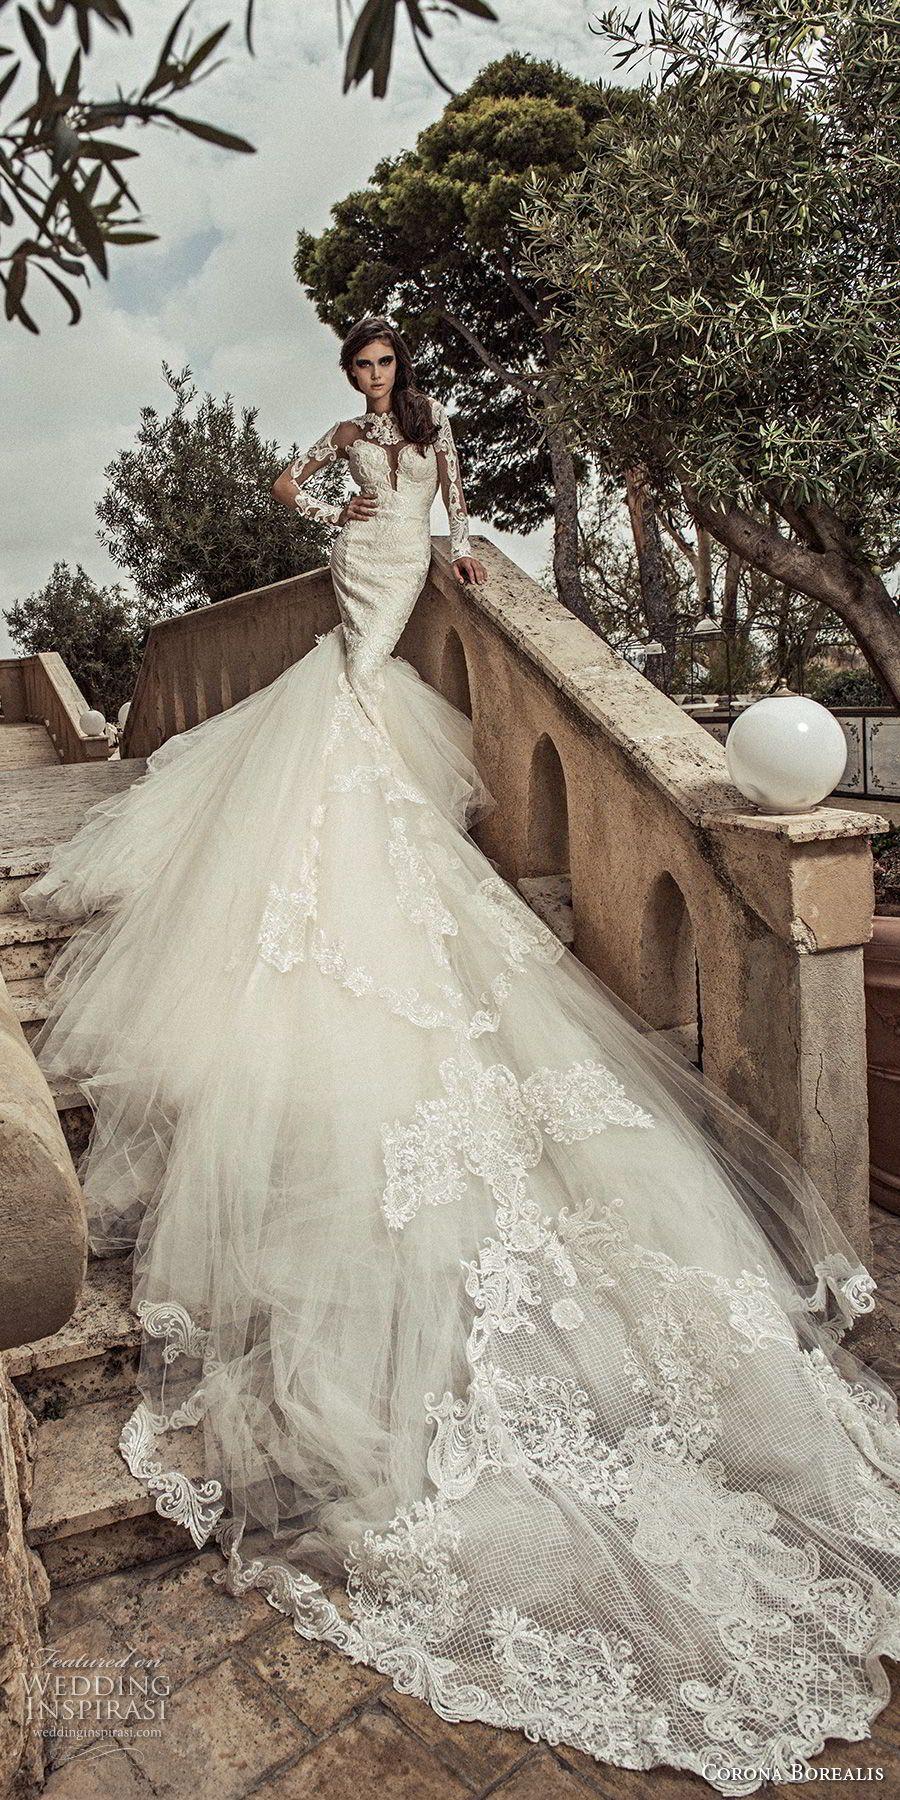 Corona borealis wedding dresses drawing ideas pinterest